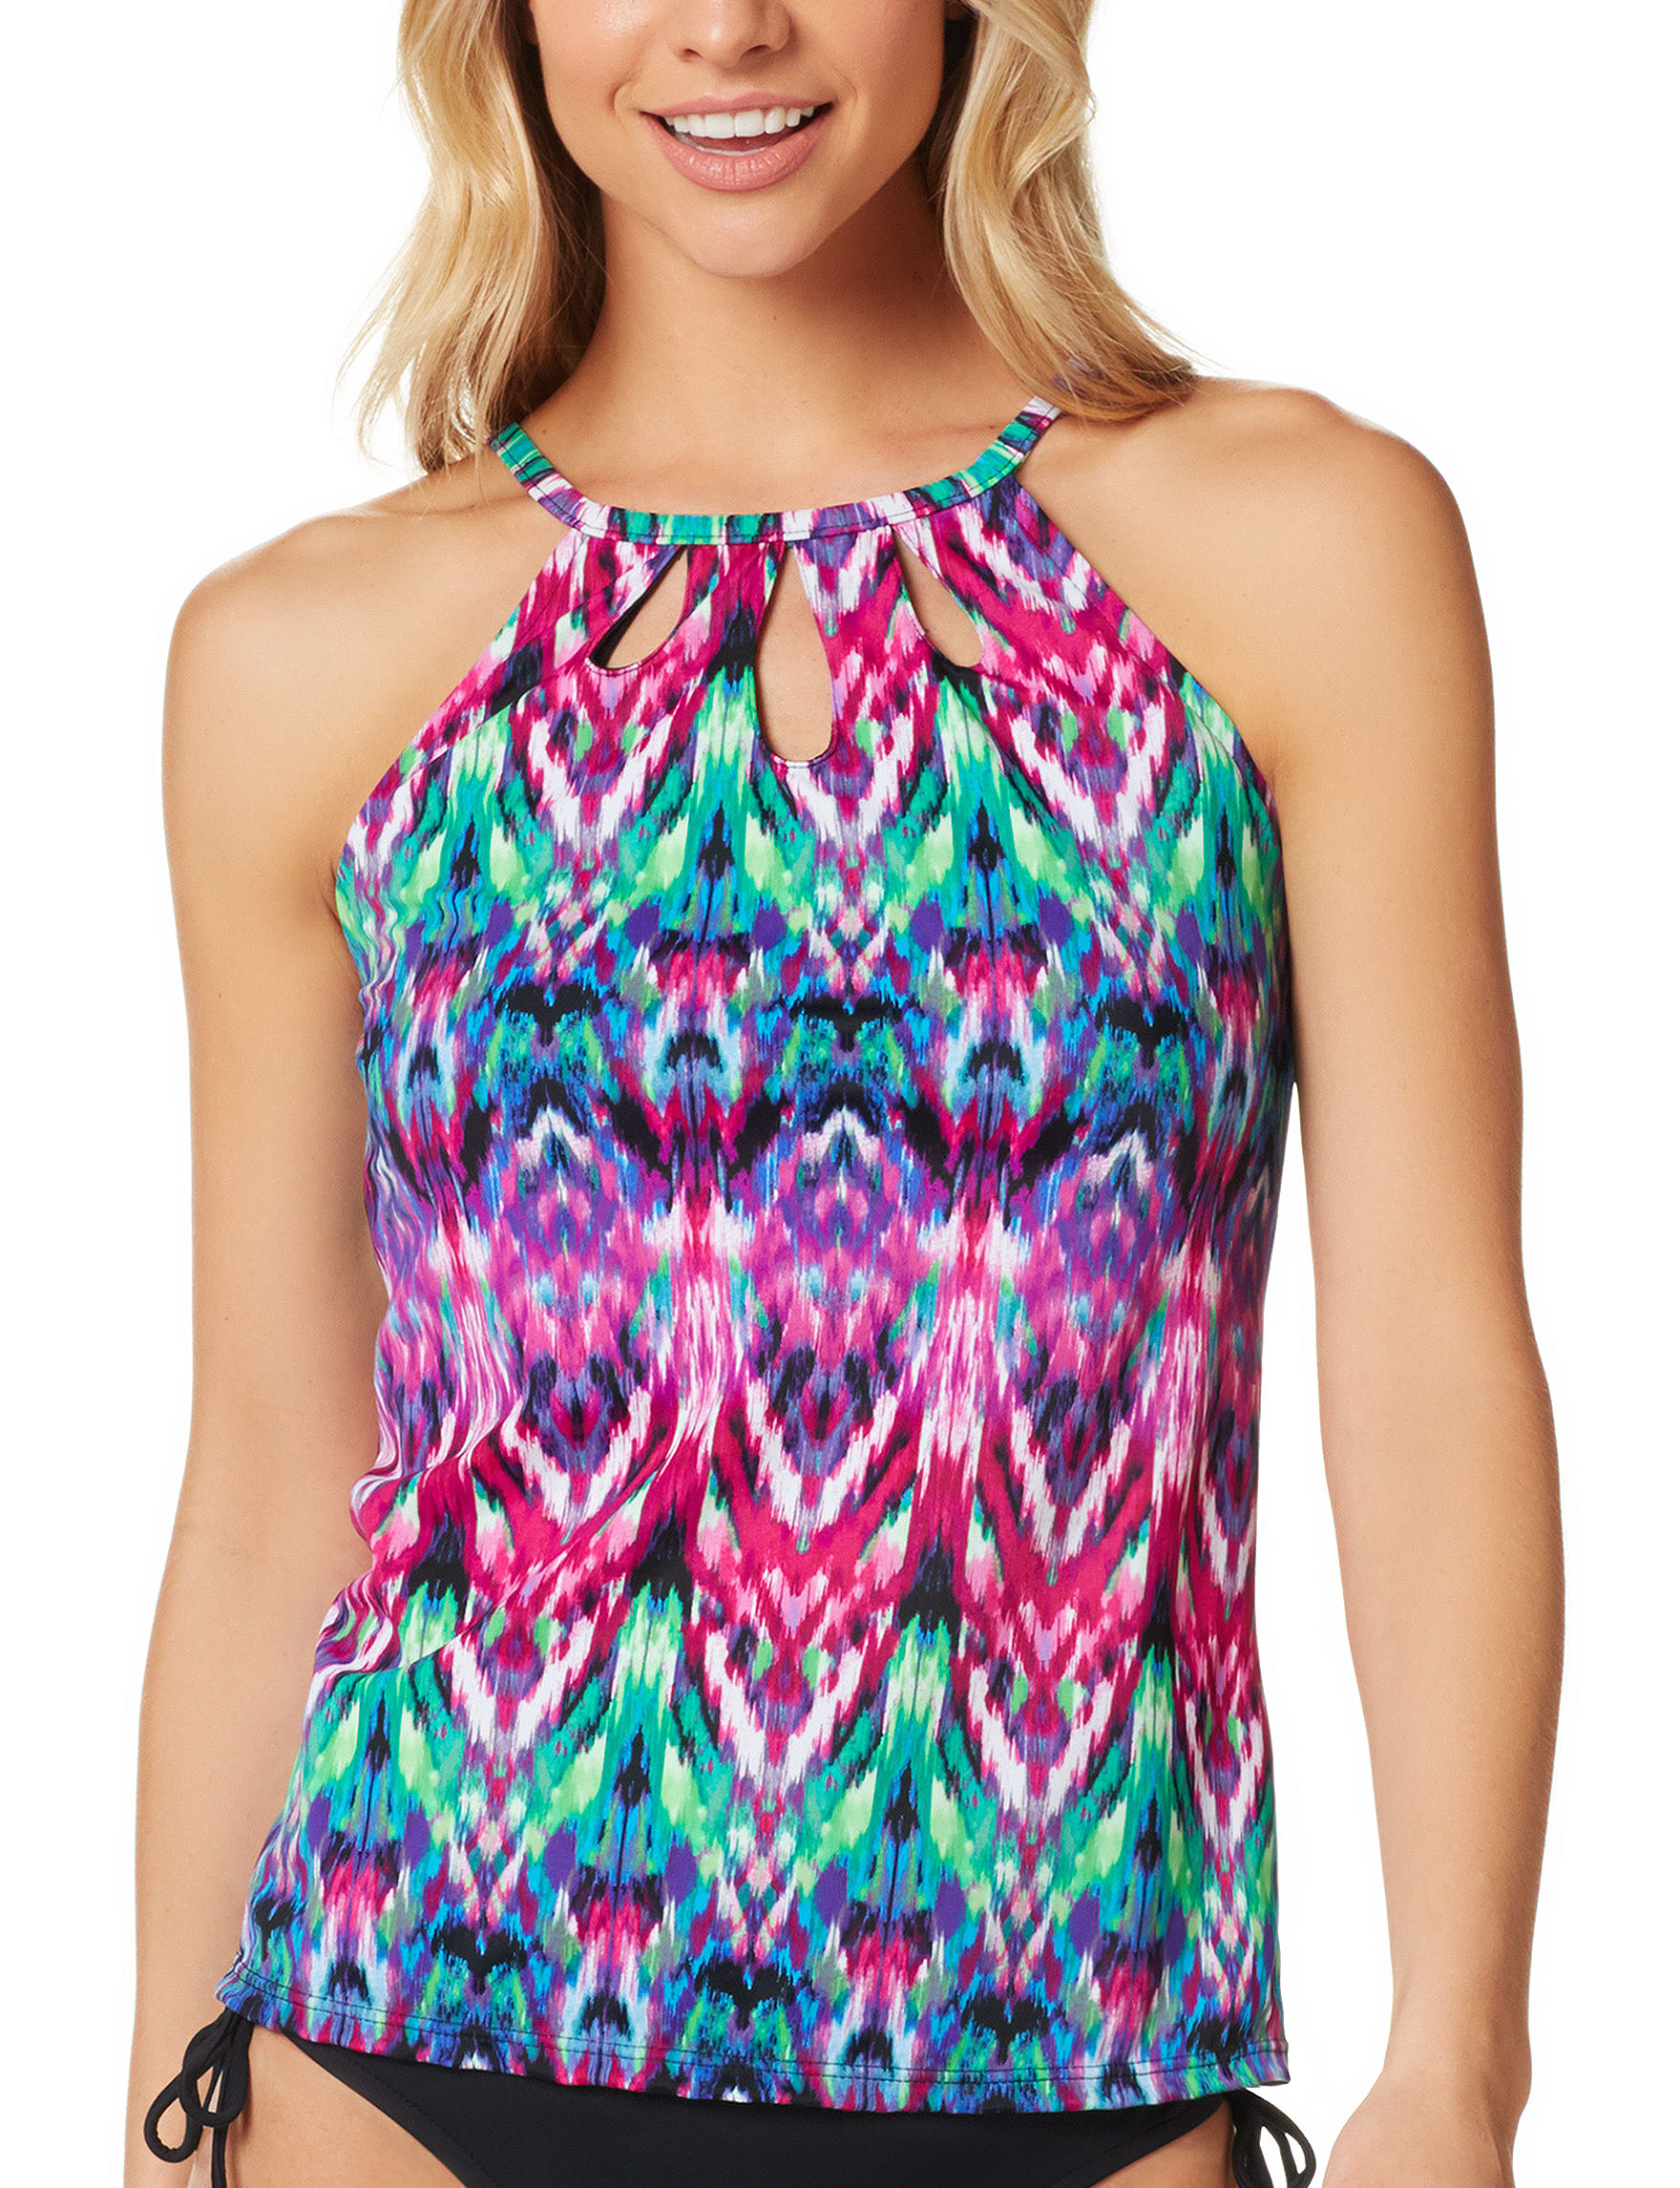 Caribbean Joe Blue Multi Swimsuit Tops High Neck Tankini